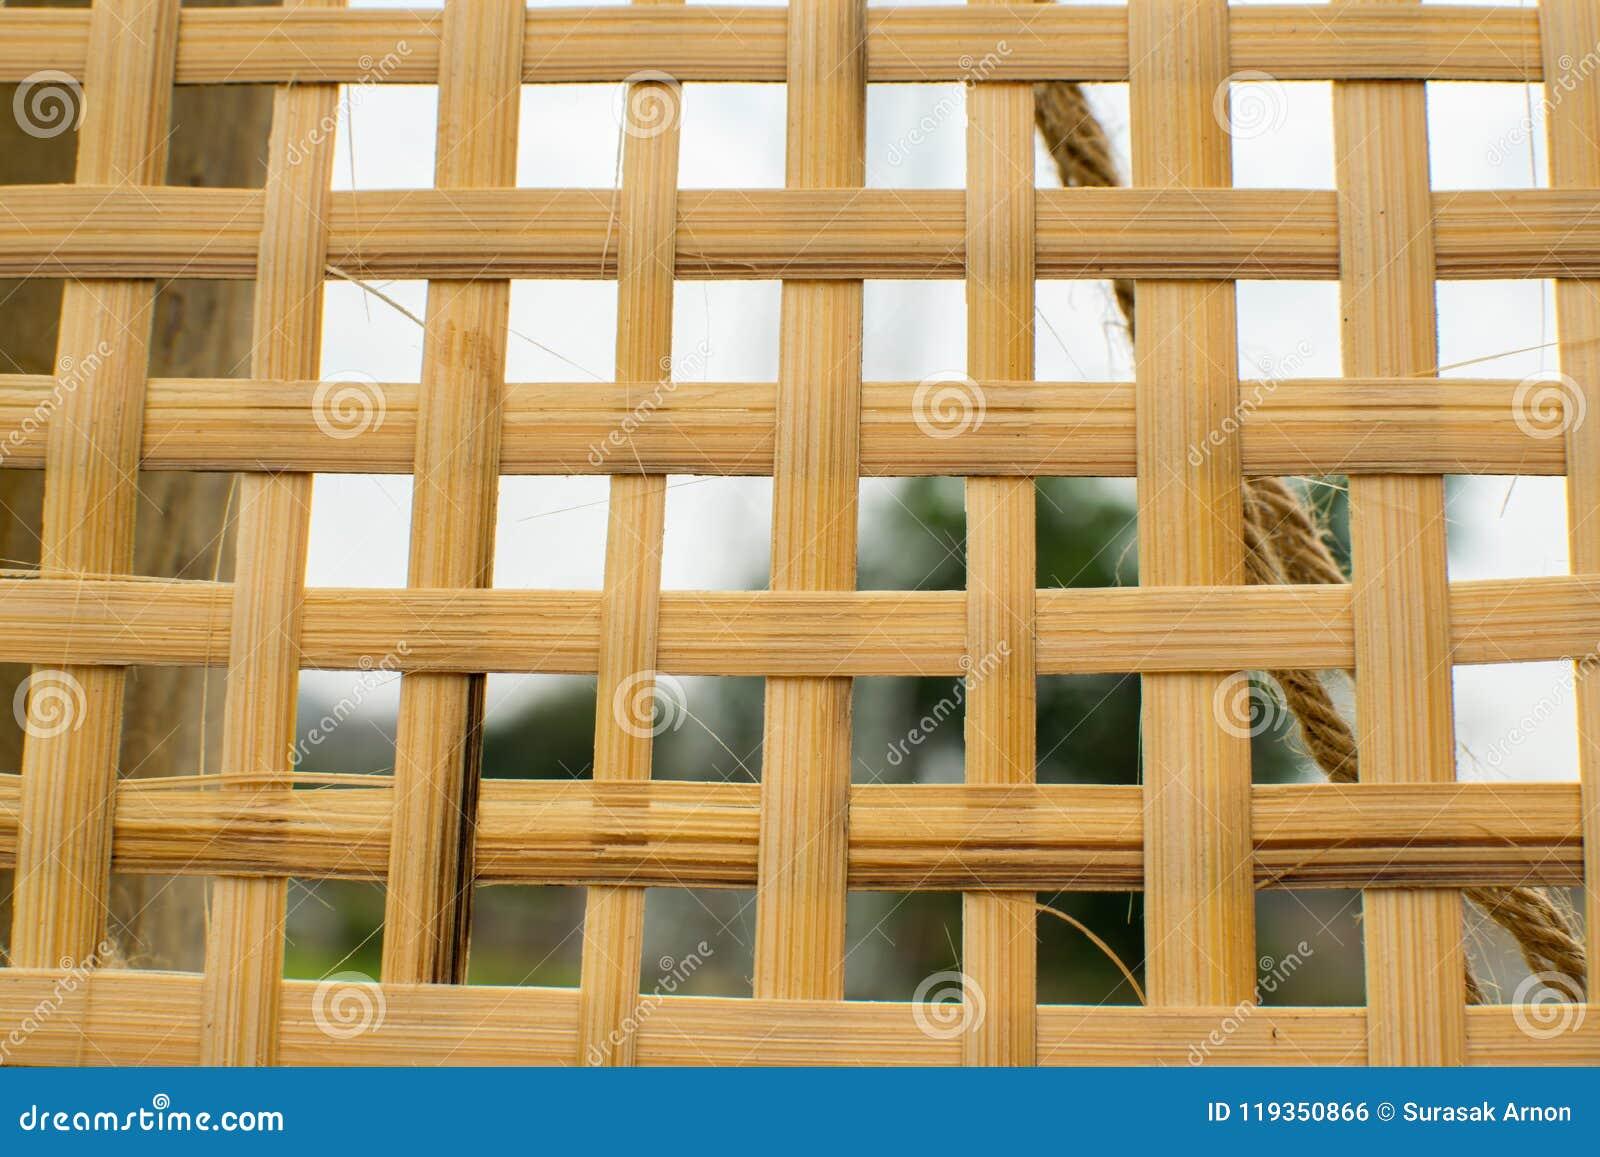 Unique Bamboo Window 10